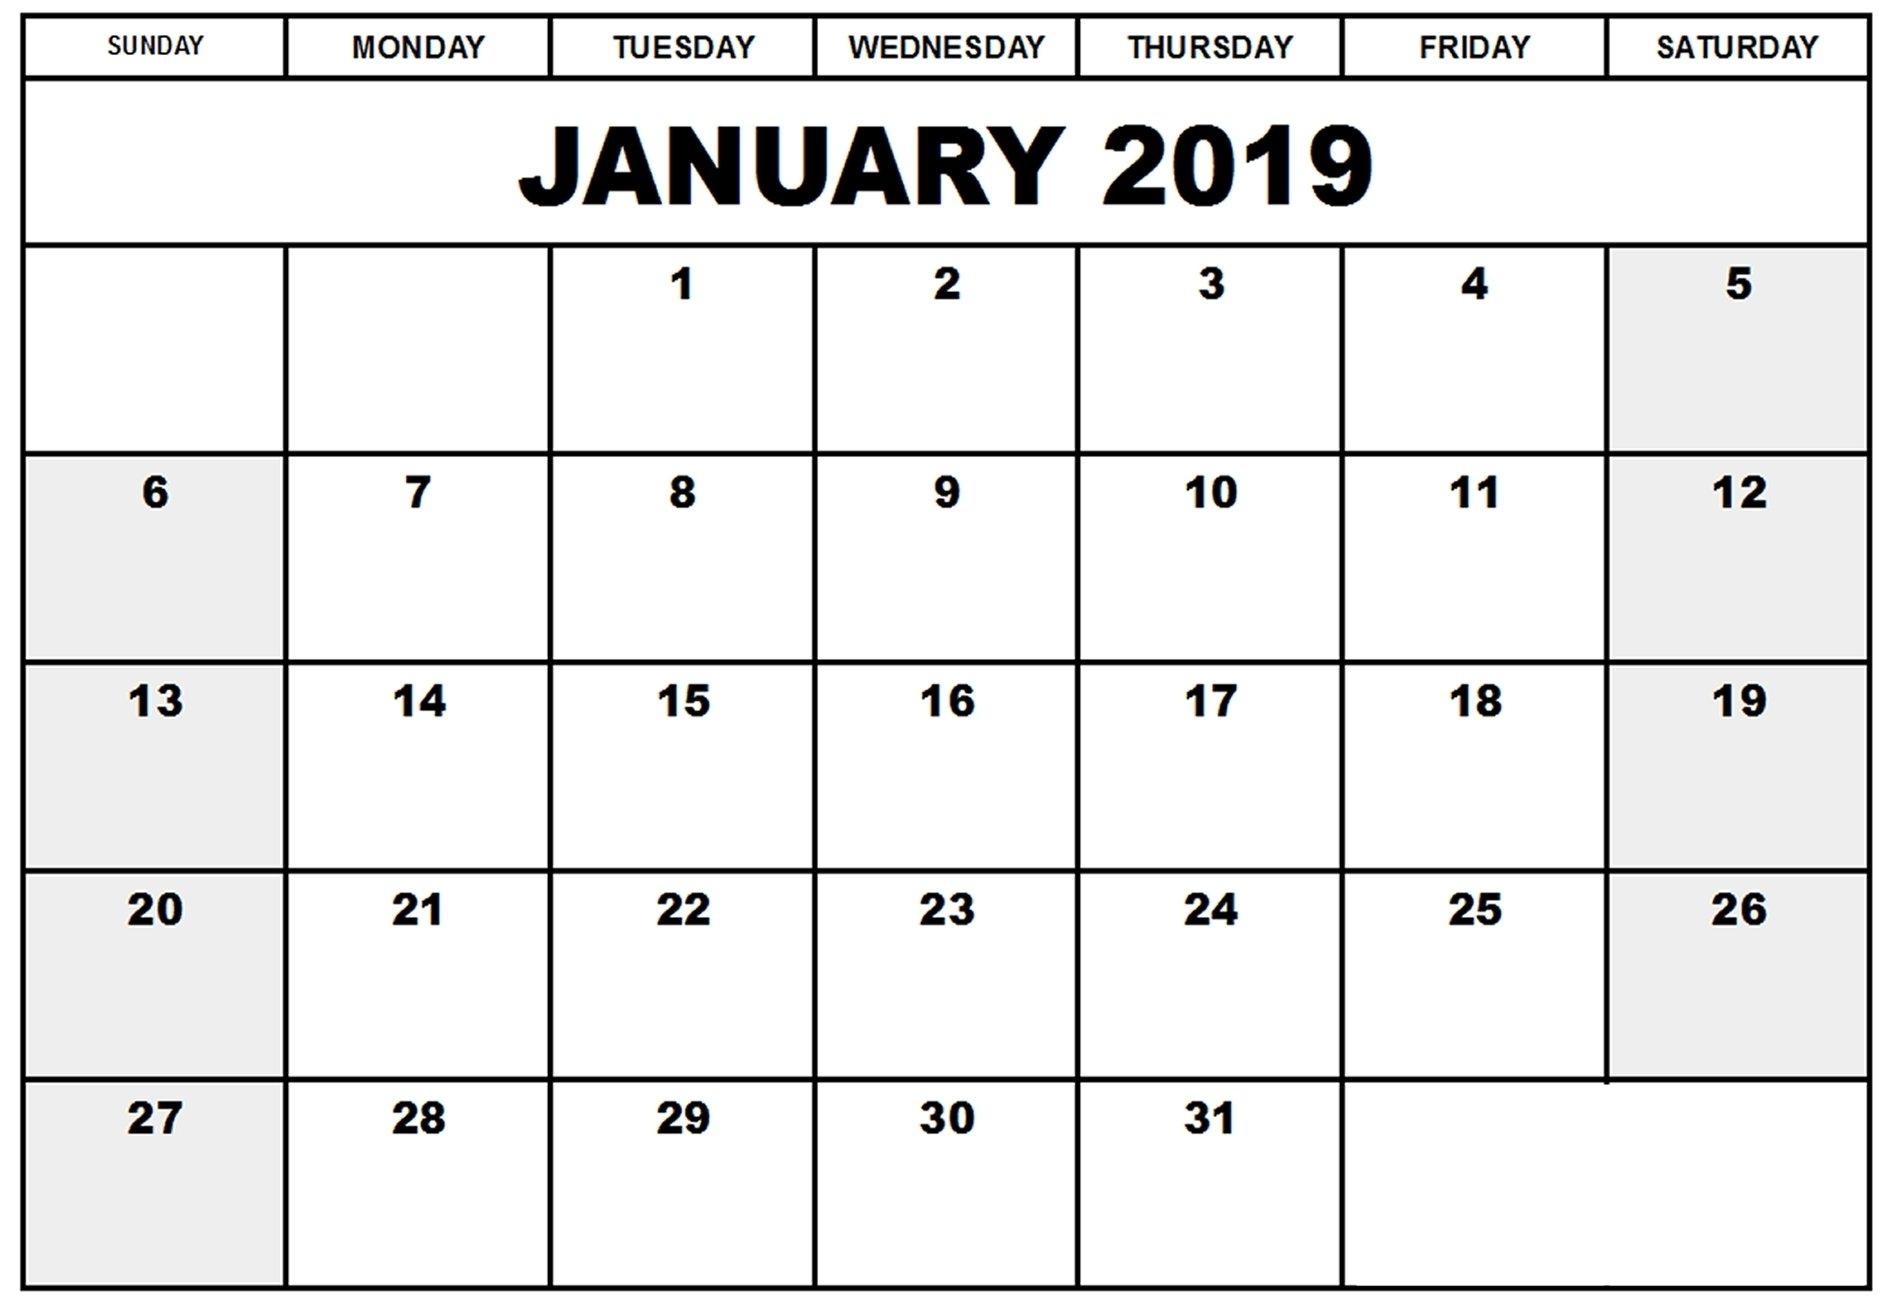 January 2019 Calendar Etsy Free Printable Words Calendar 2019 Etsy